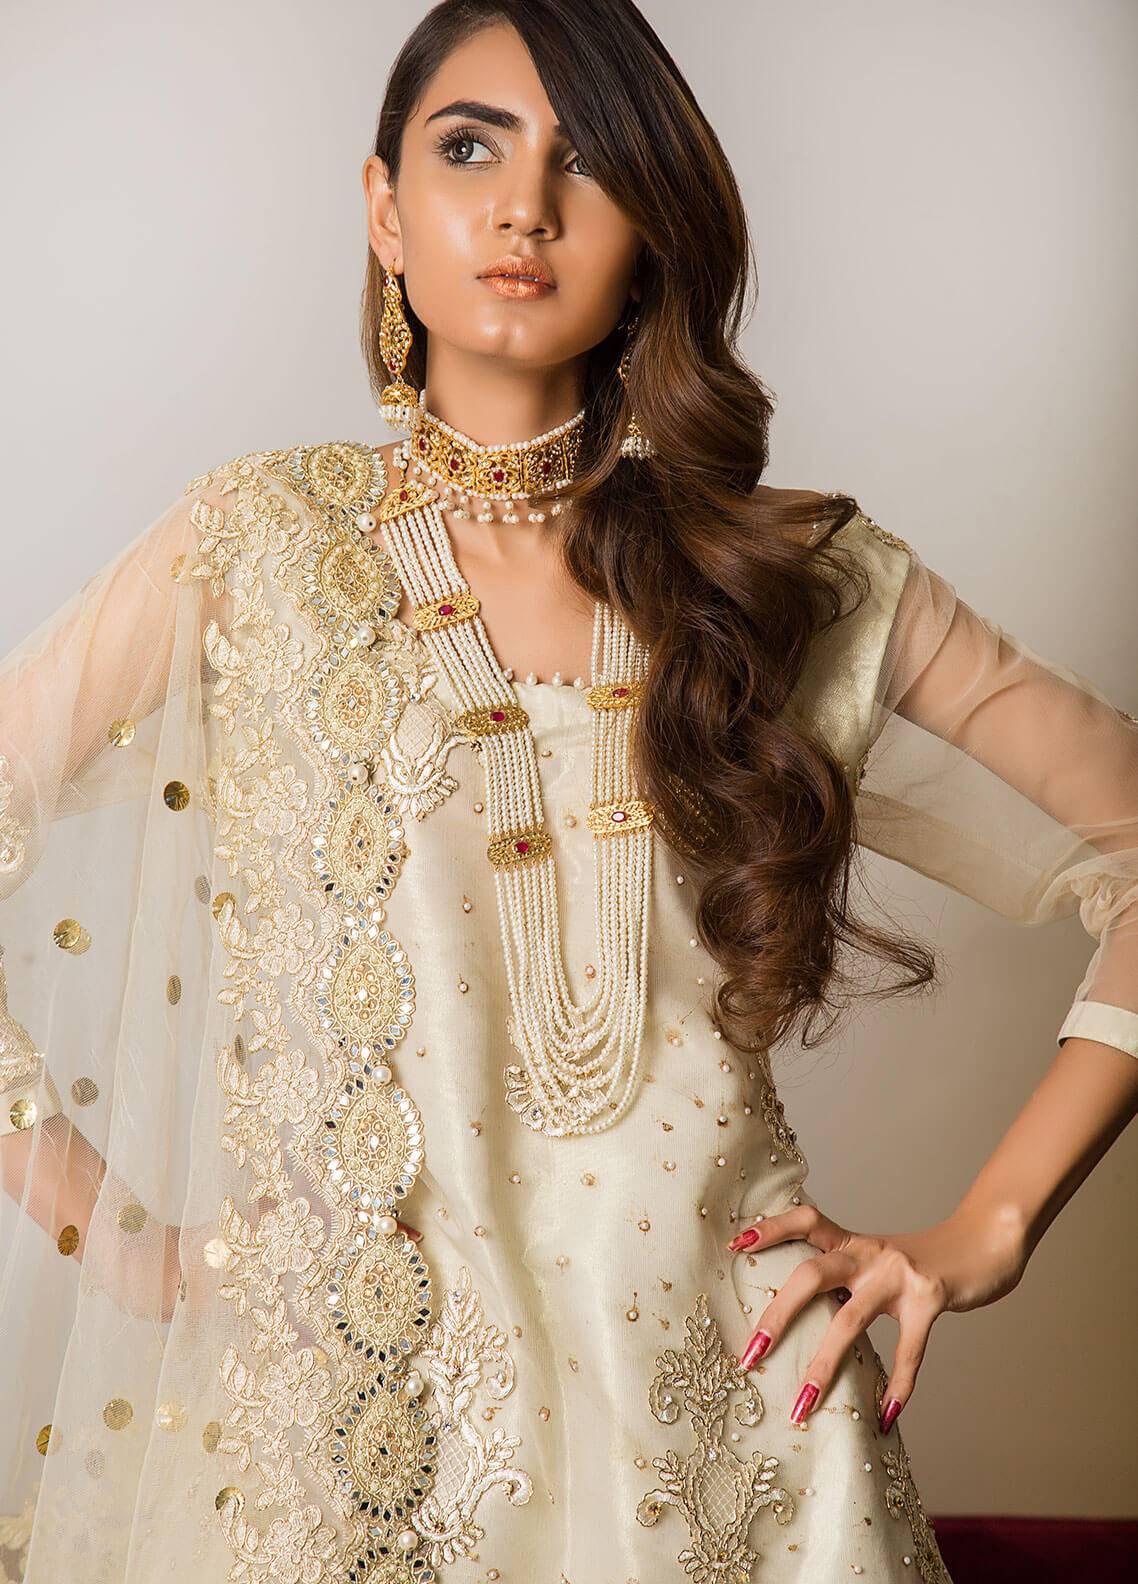 Momal Khan Embroidered  Stitched Bridal Suit MK-08B Sangrai